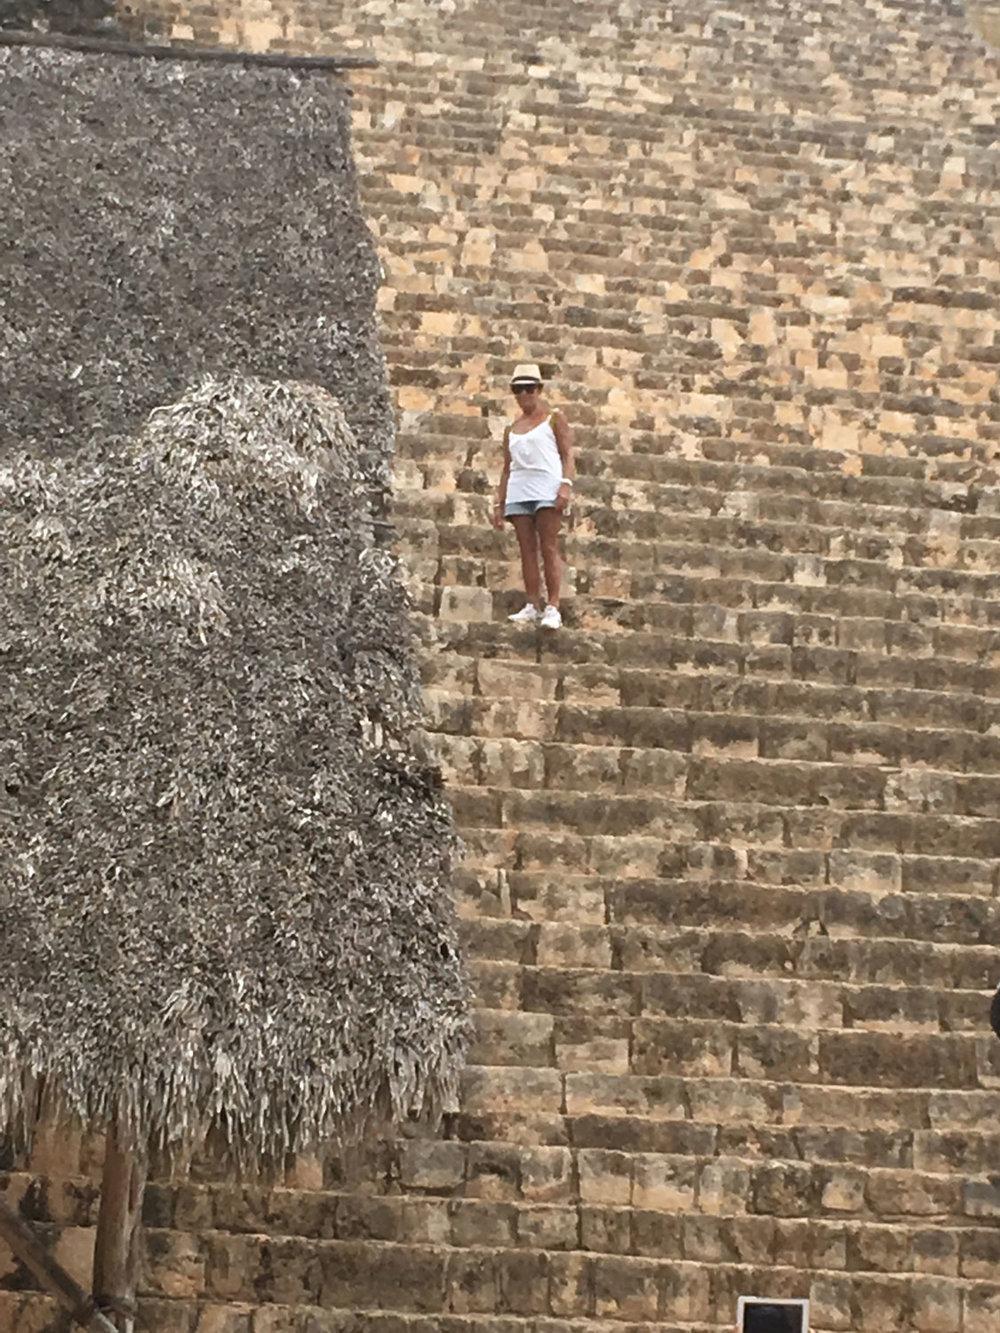 Hammocks_and_Ruins_Blog_Riviera_Maya_Mexico_Travel_Discover_Explore_Yucatan_Pyramid_Temple_Ek_Balam_19.jpg